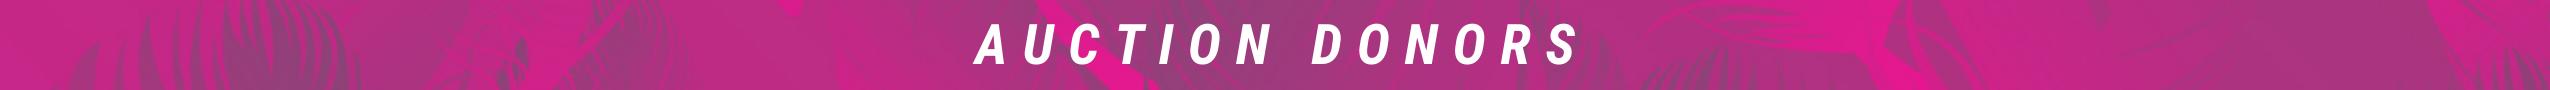 2021 Gala Website Banners